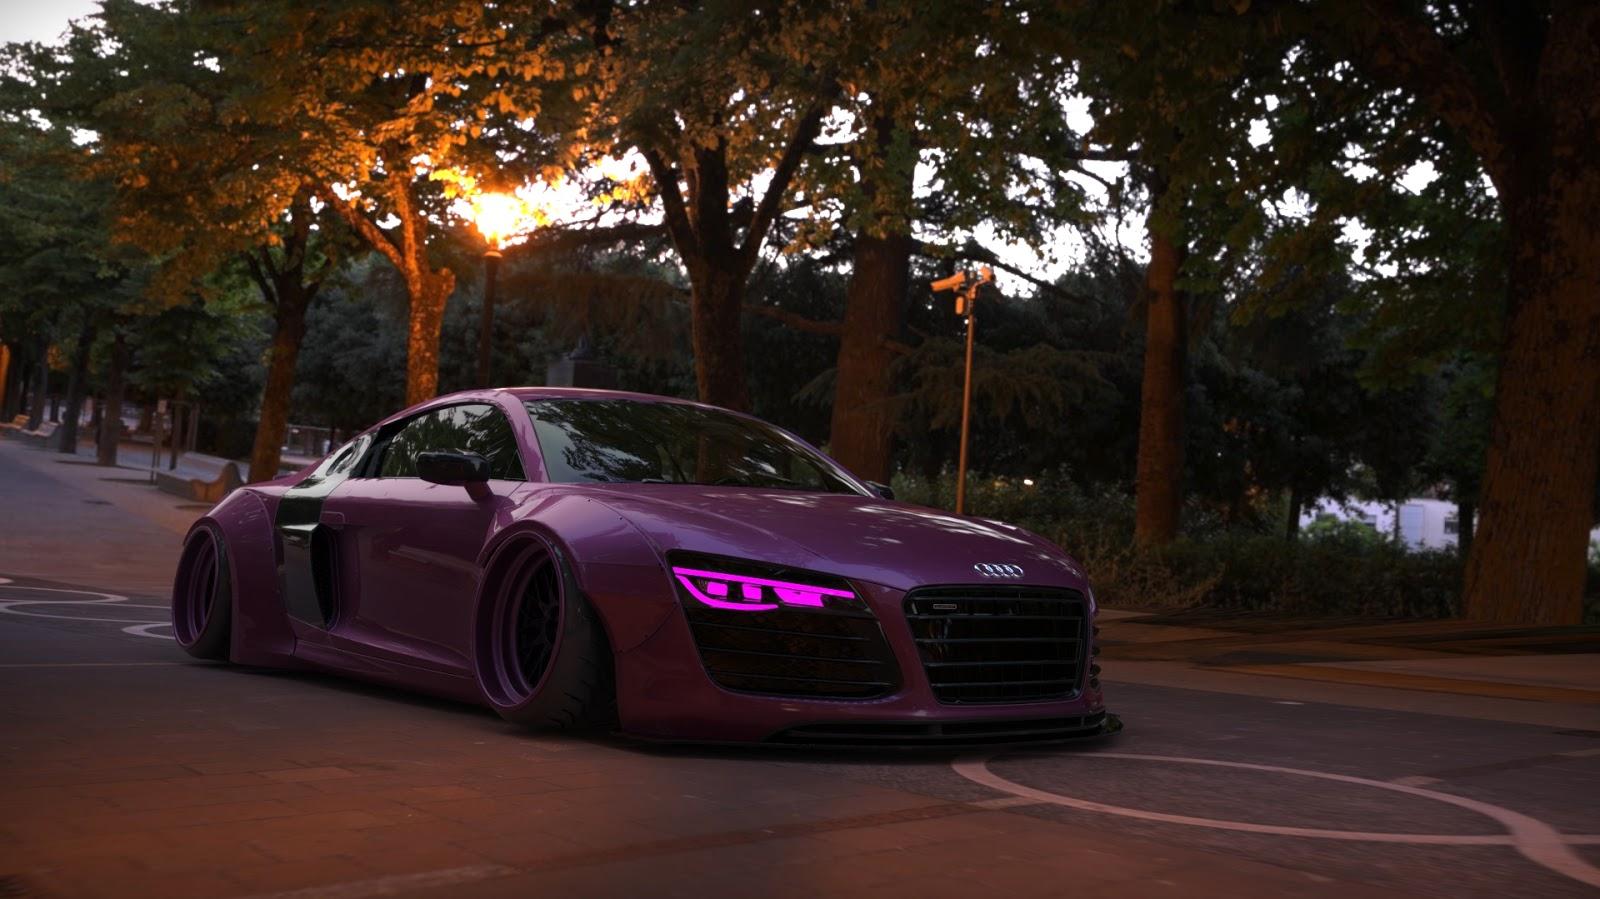 Forza Horizon 3 Wallpaper Hd Audi R8 Liberty Walk Performance Gta 3dmodding